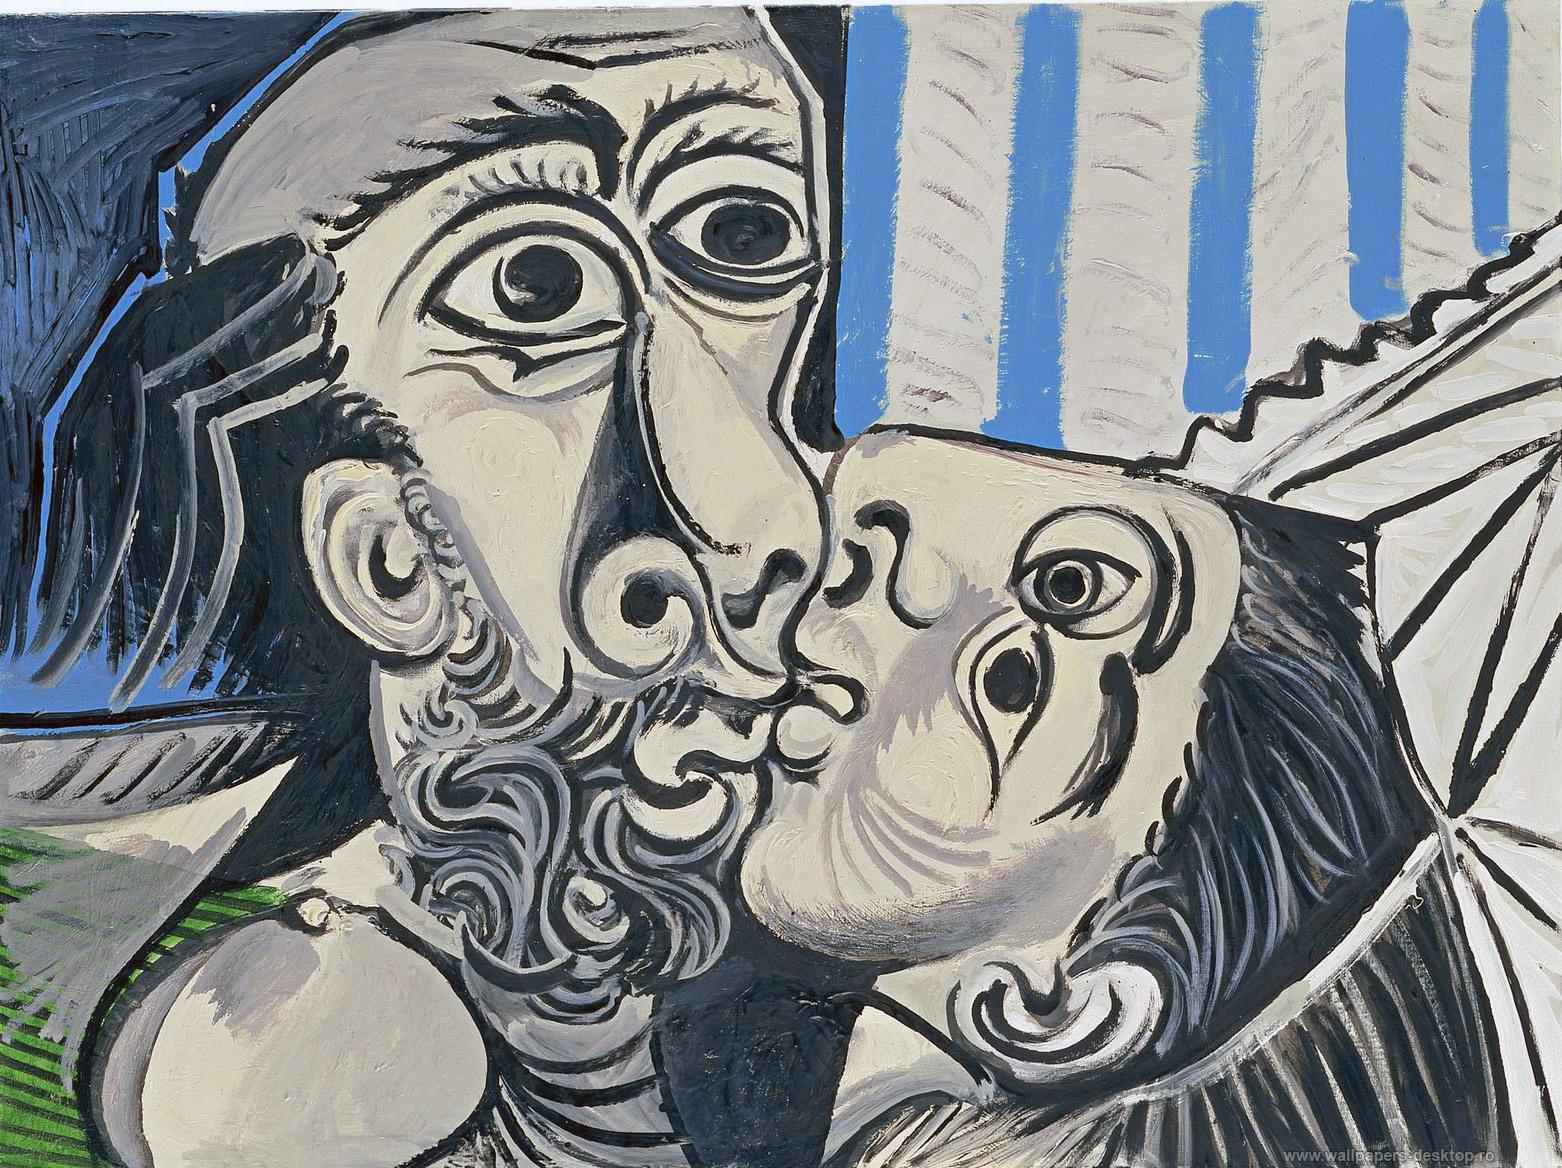 HDoboi.Kiev.ua - Поцелуй Пикассо, картина, обои на телефон компьютер, искусство, арт, живопись